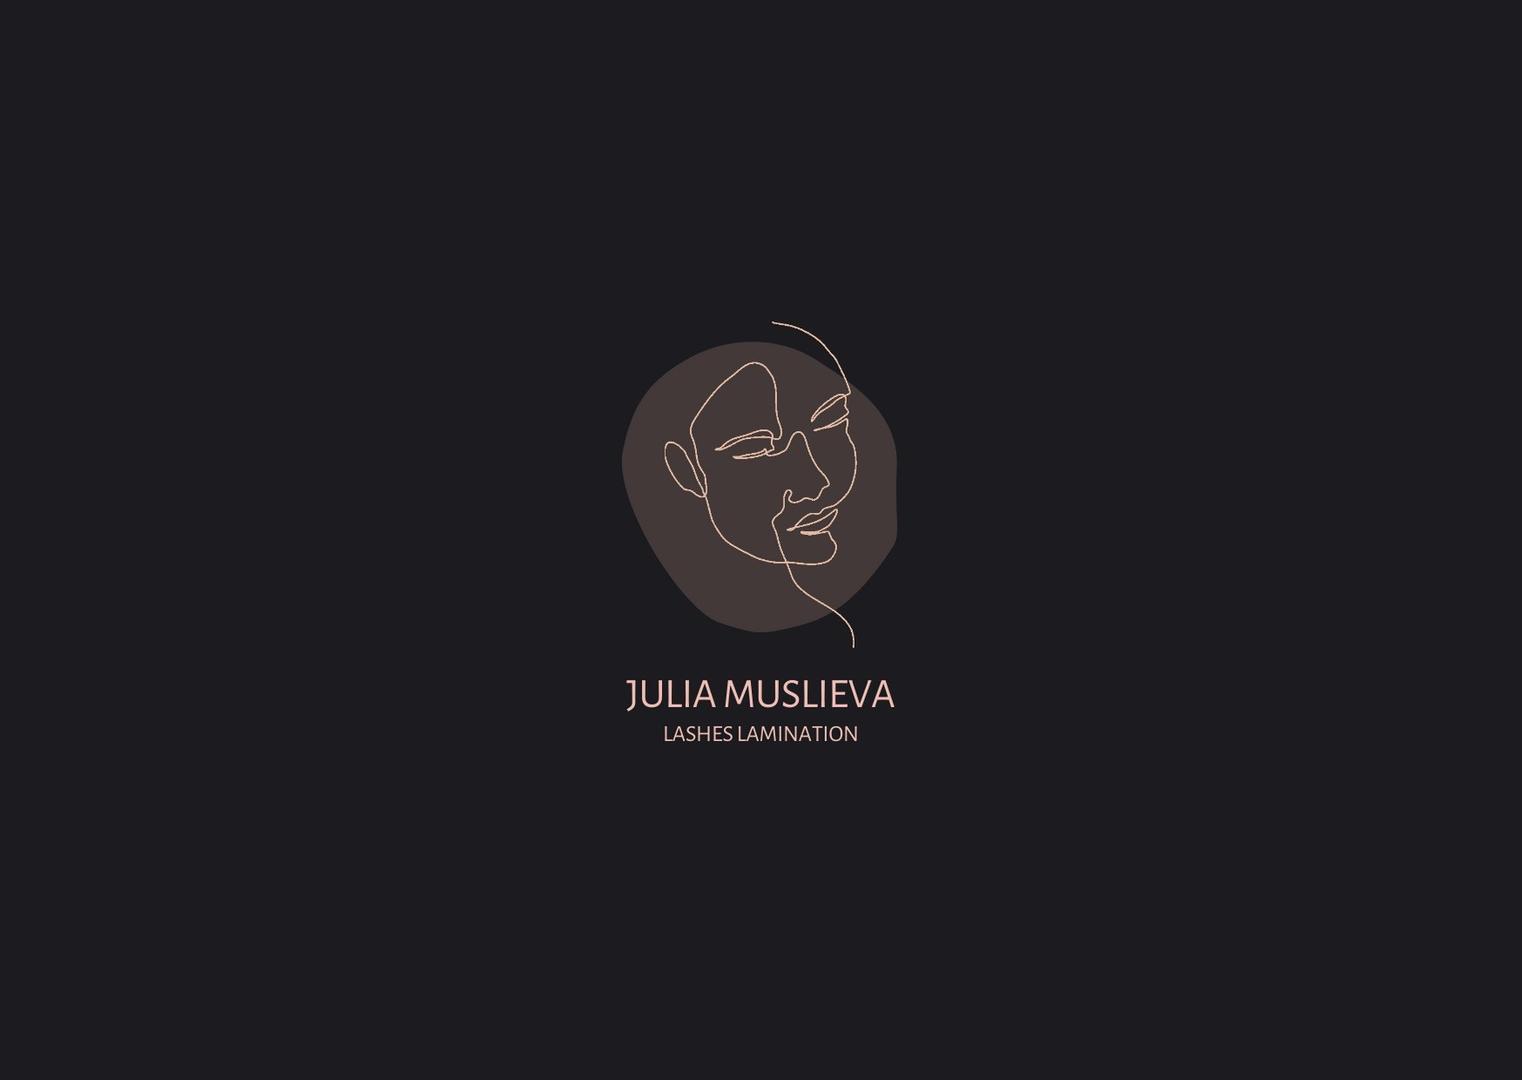 Julia Muslieva